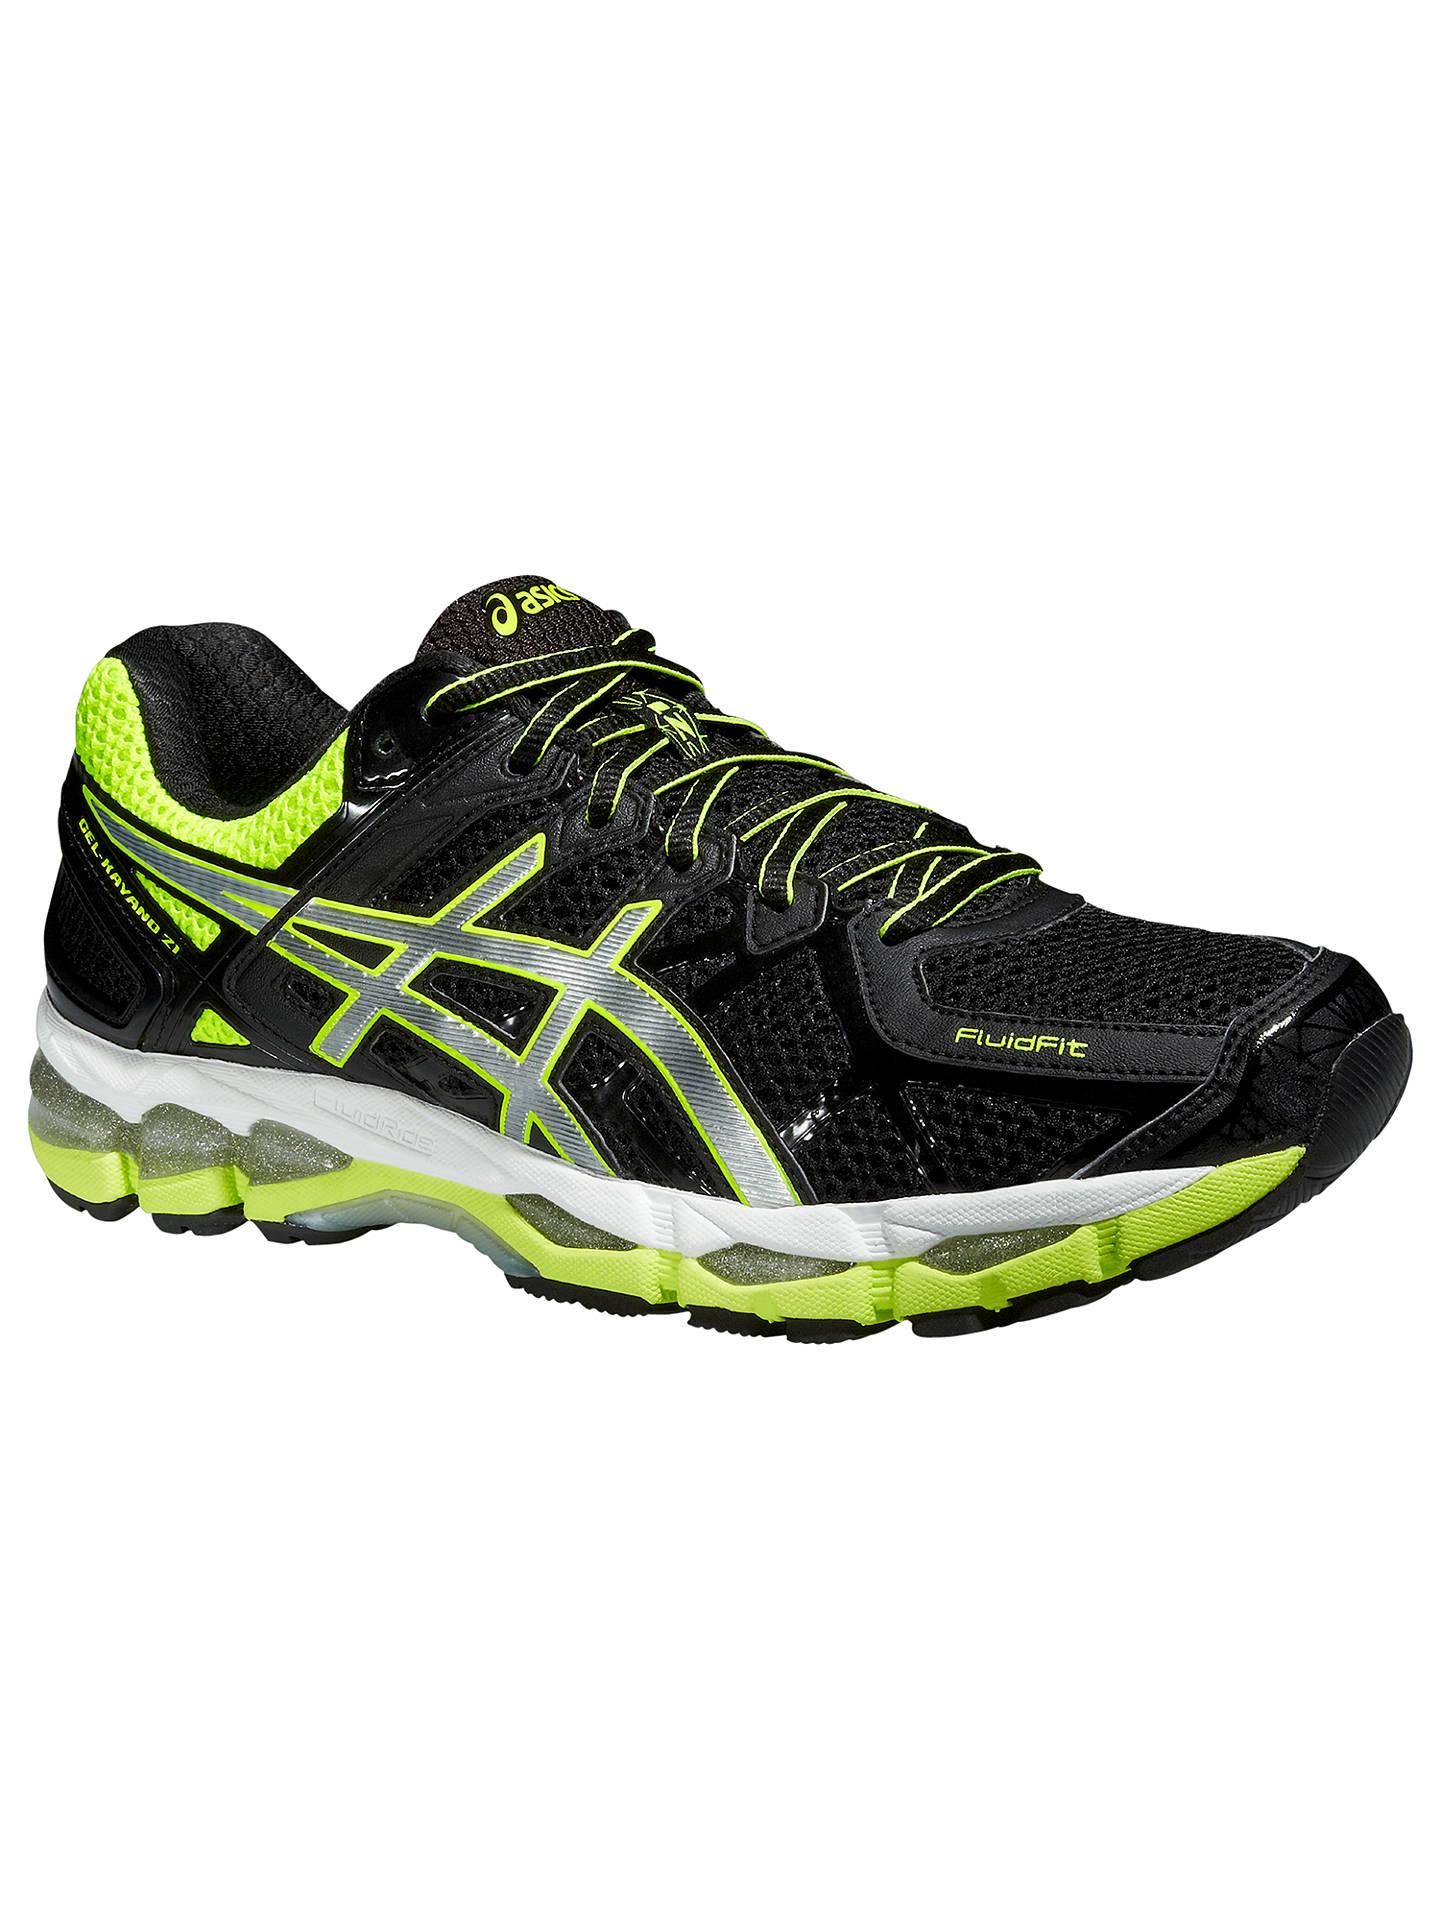 buy online 2ee7c 8e2f9 Buy Asics Gel-Kayano 21 Men s Structured Running Shoes, Black Silver, 7 ...